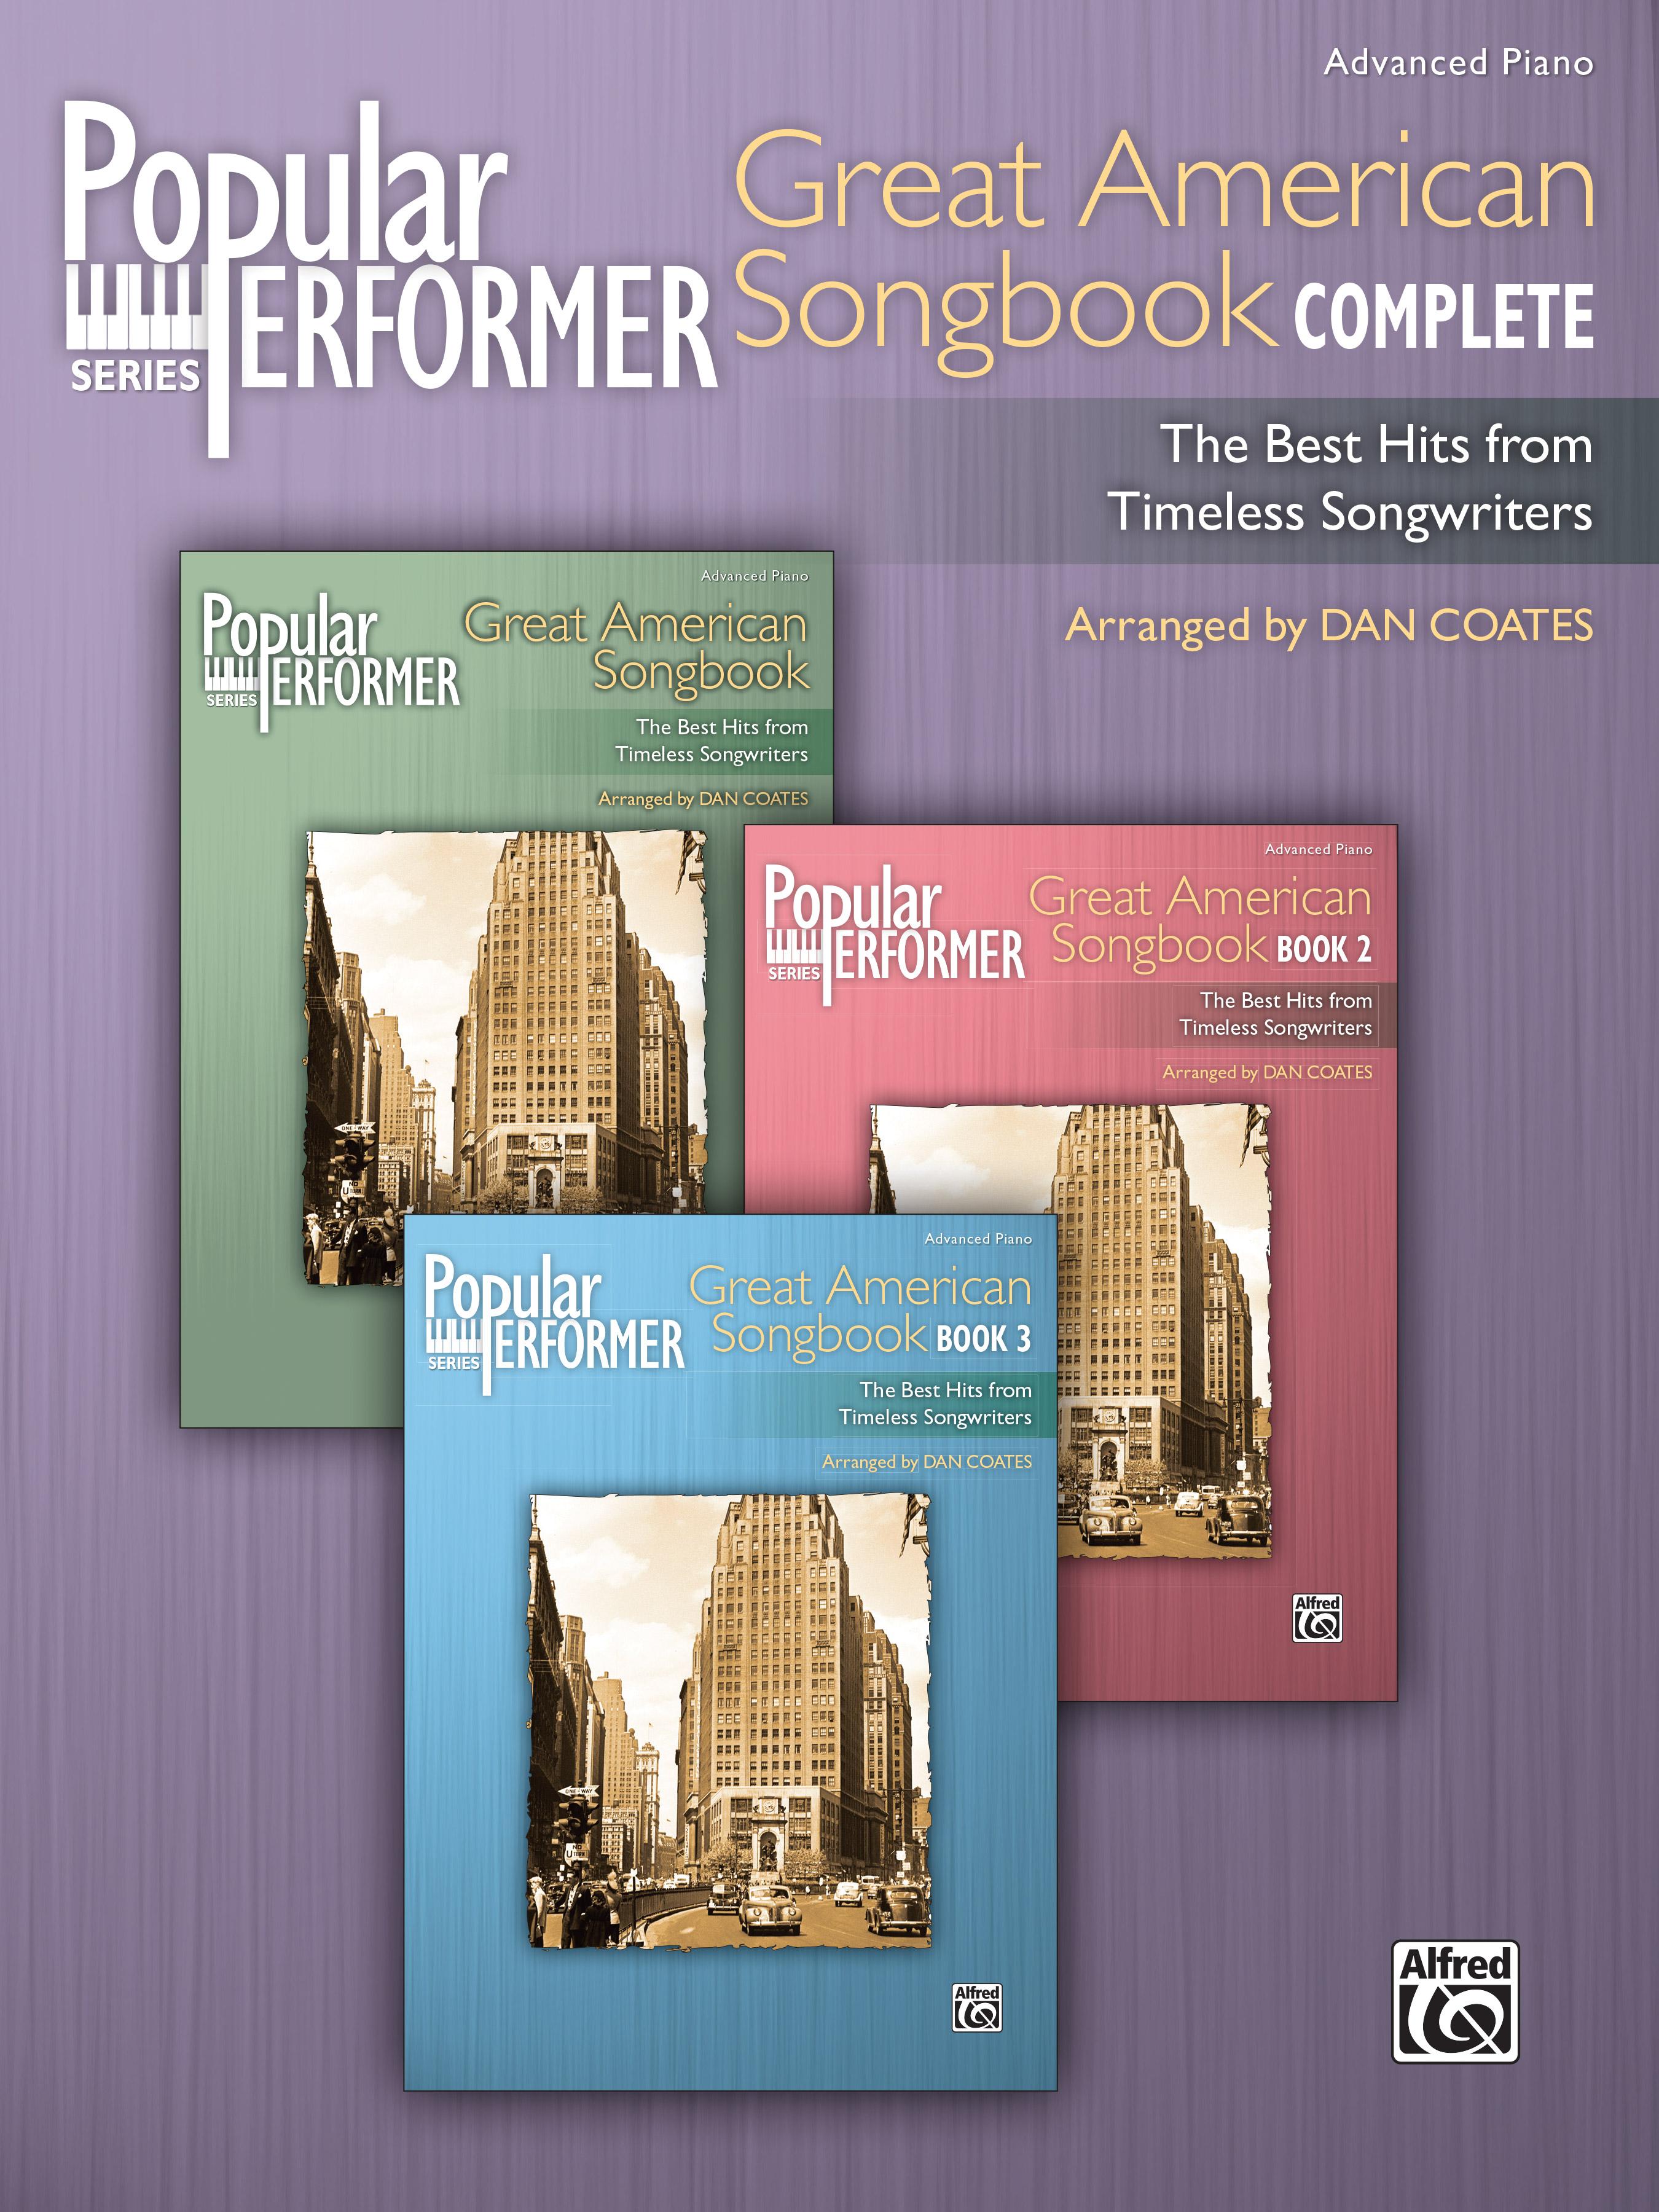 Popular Performer Great America Songbook Complete